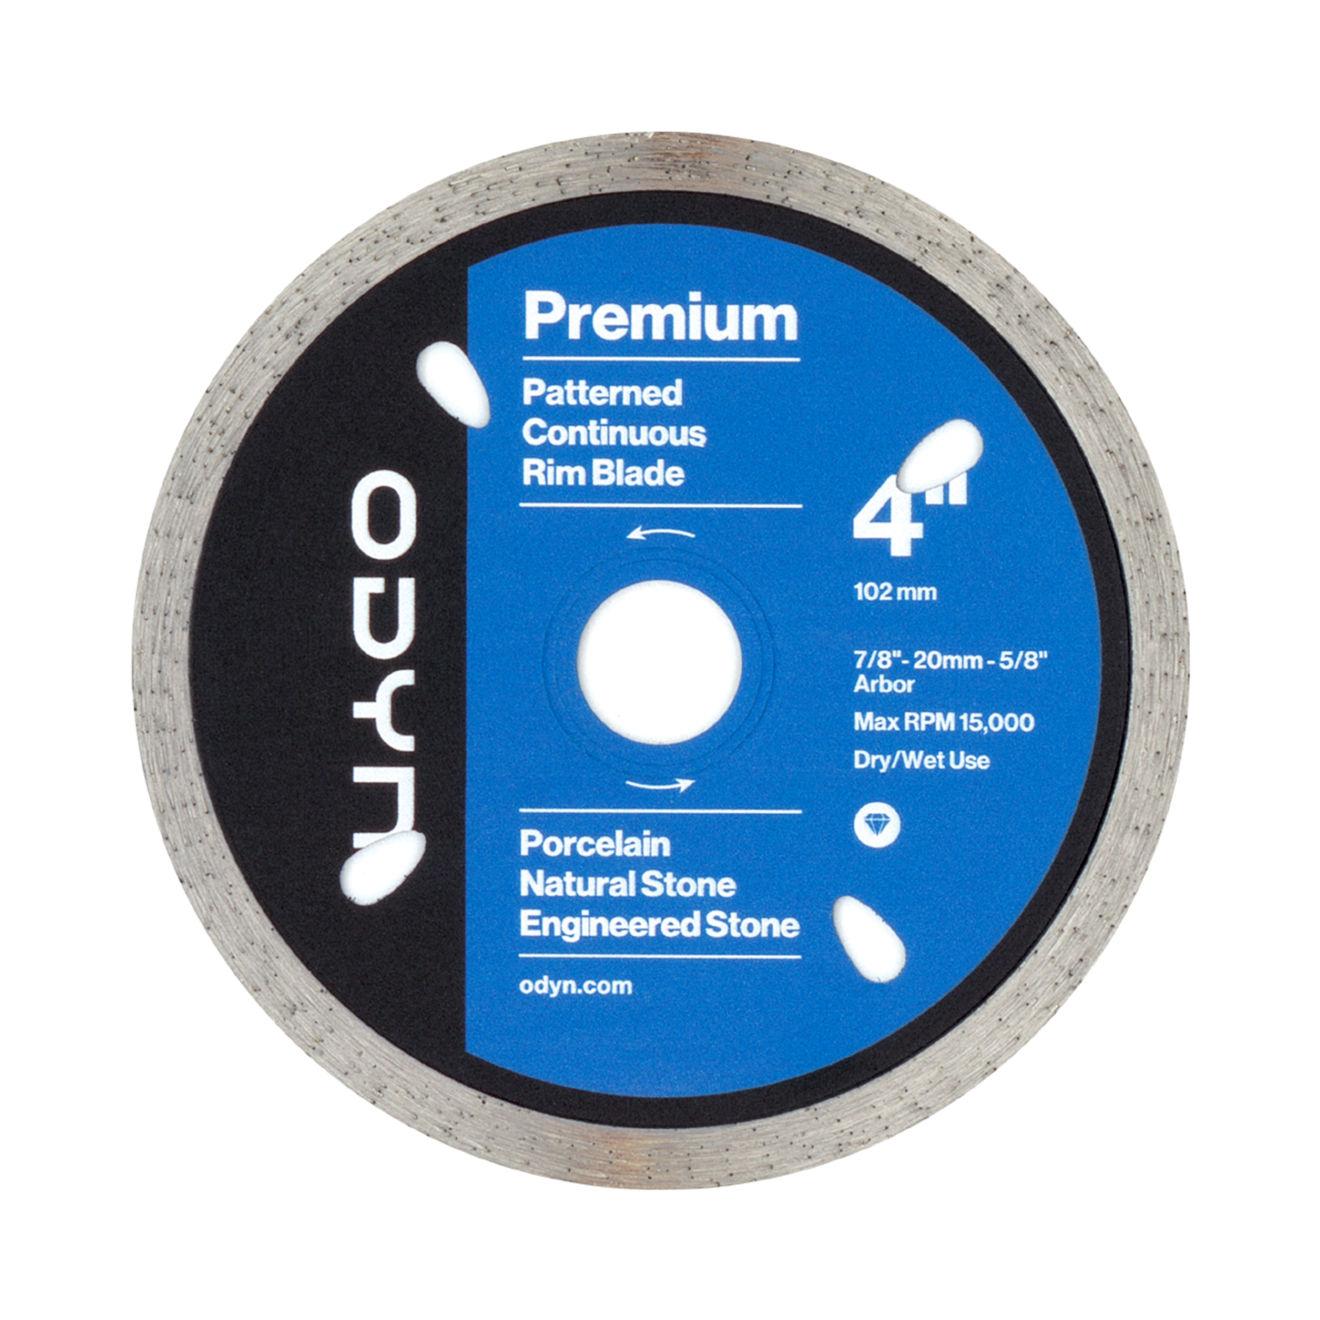 Odyn 4 in. Premium Pattern Continuous Rim Blade